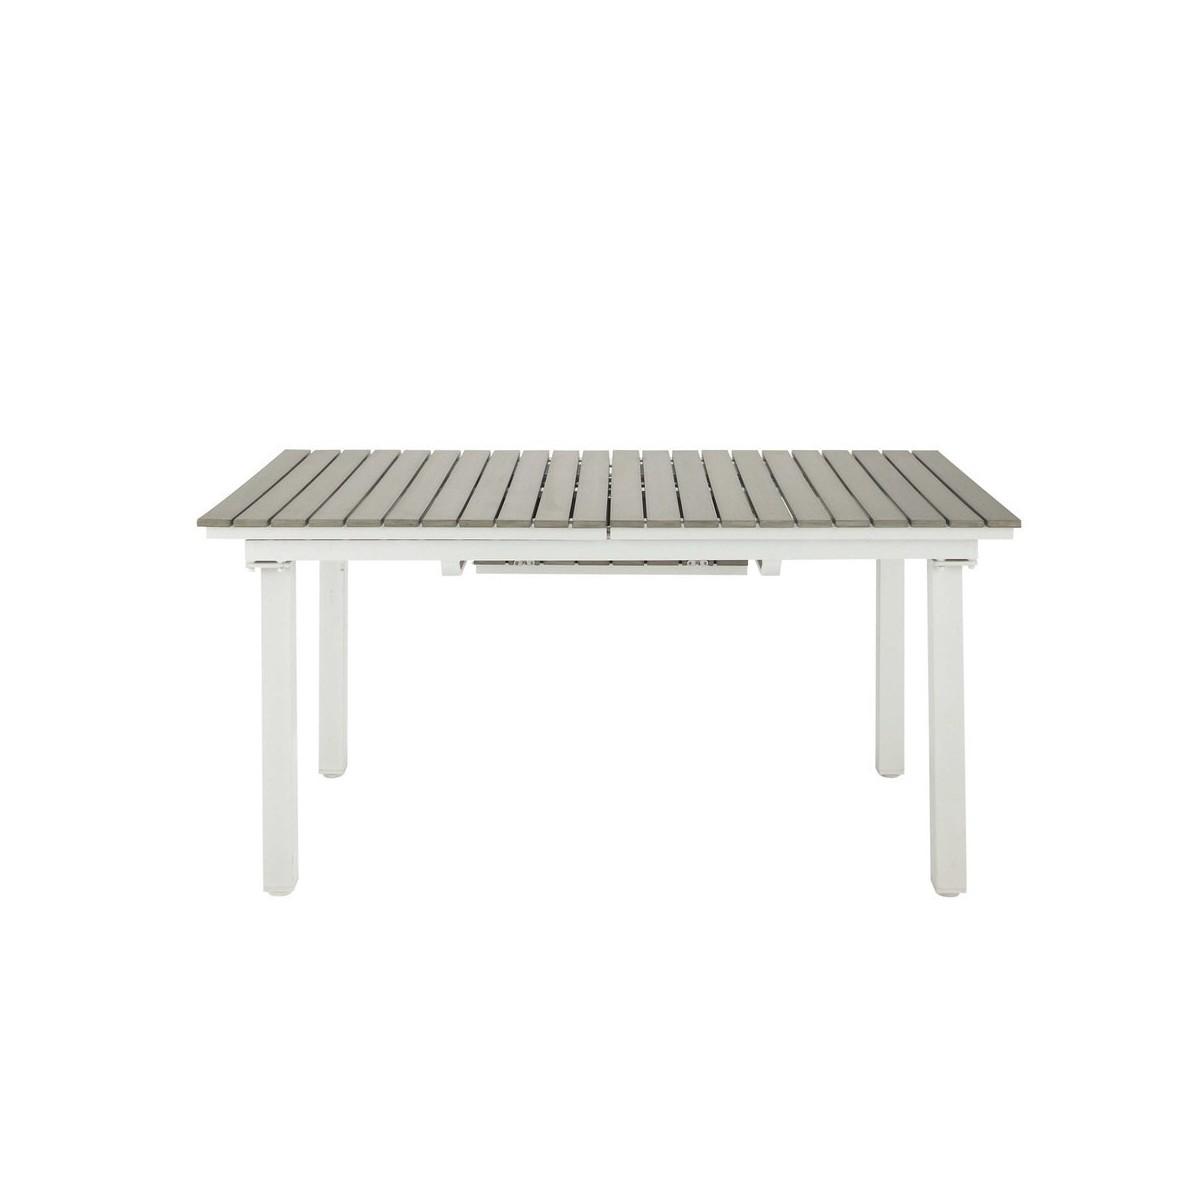 Table De Jardin Imitation Bois | Emejing Table De Jardin Pvc ...